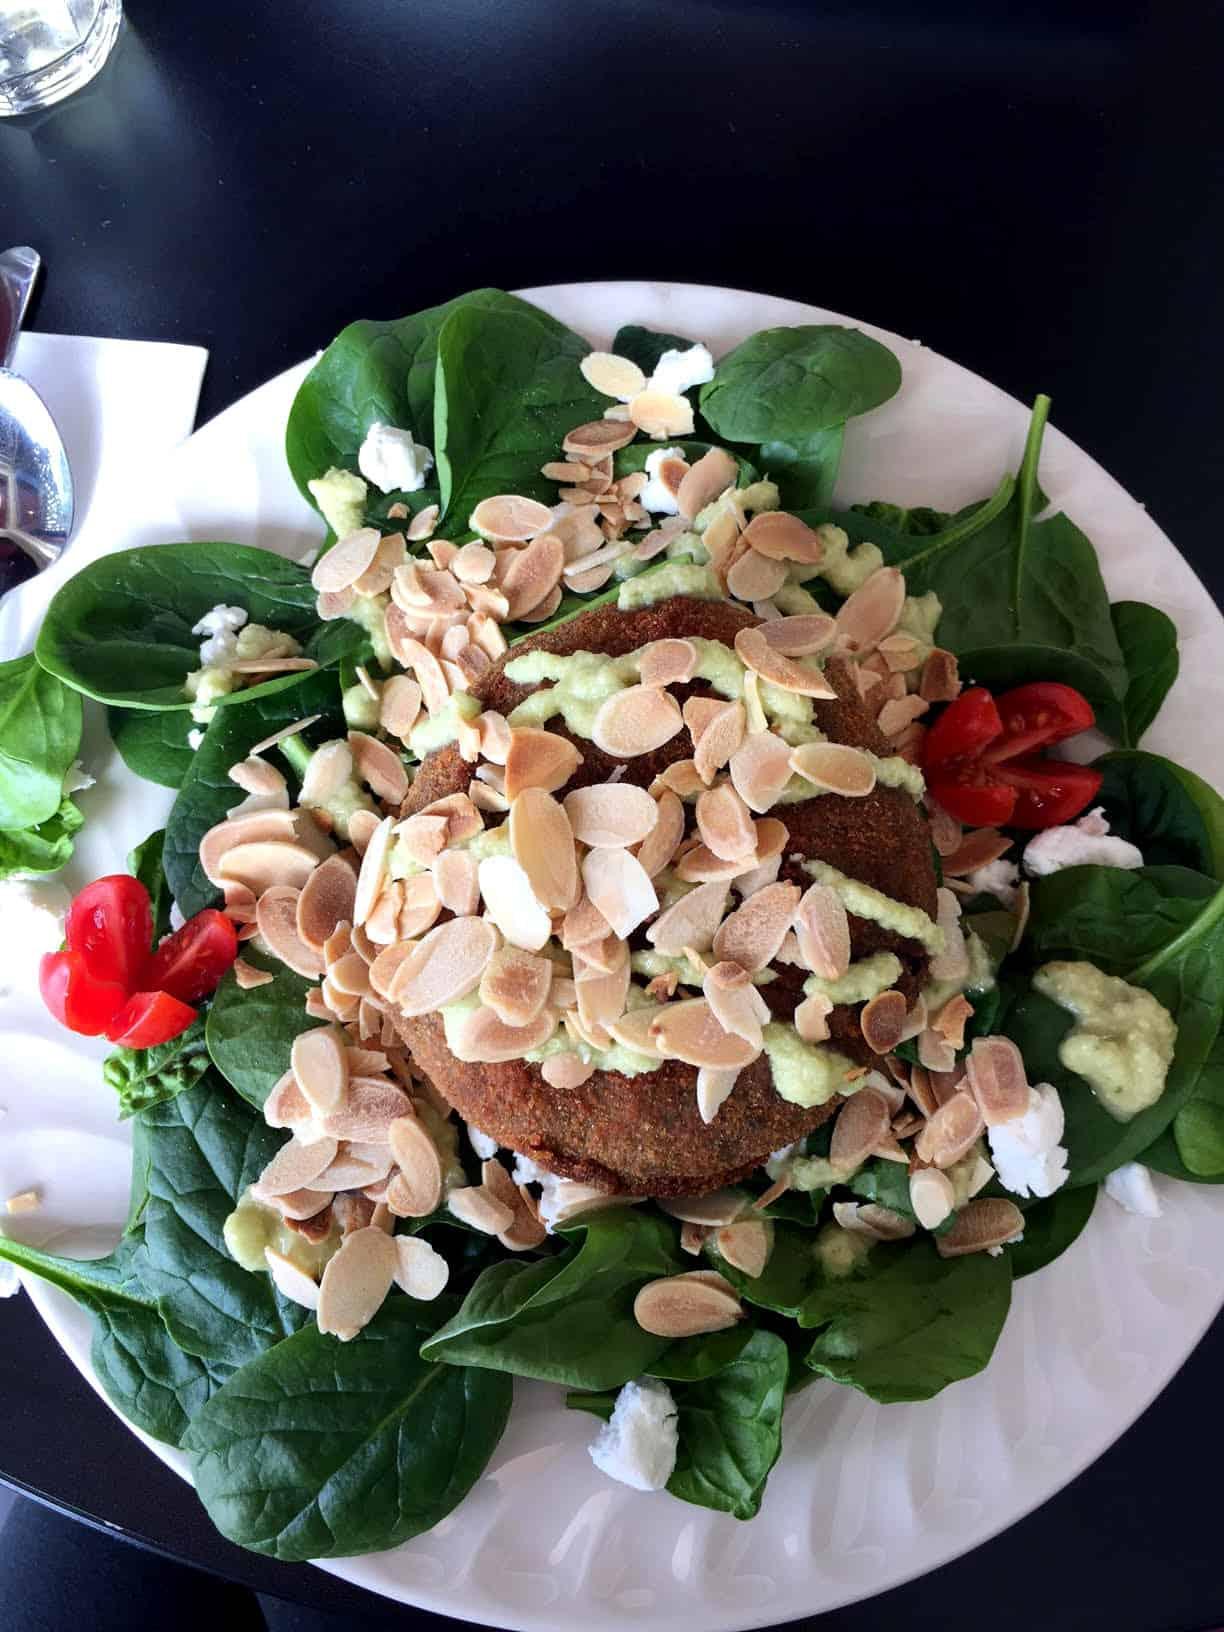 Restaurant Review: Cold Mountain Café (Bethlehem, NH)